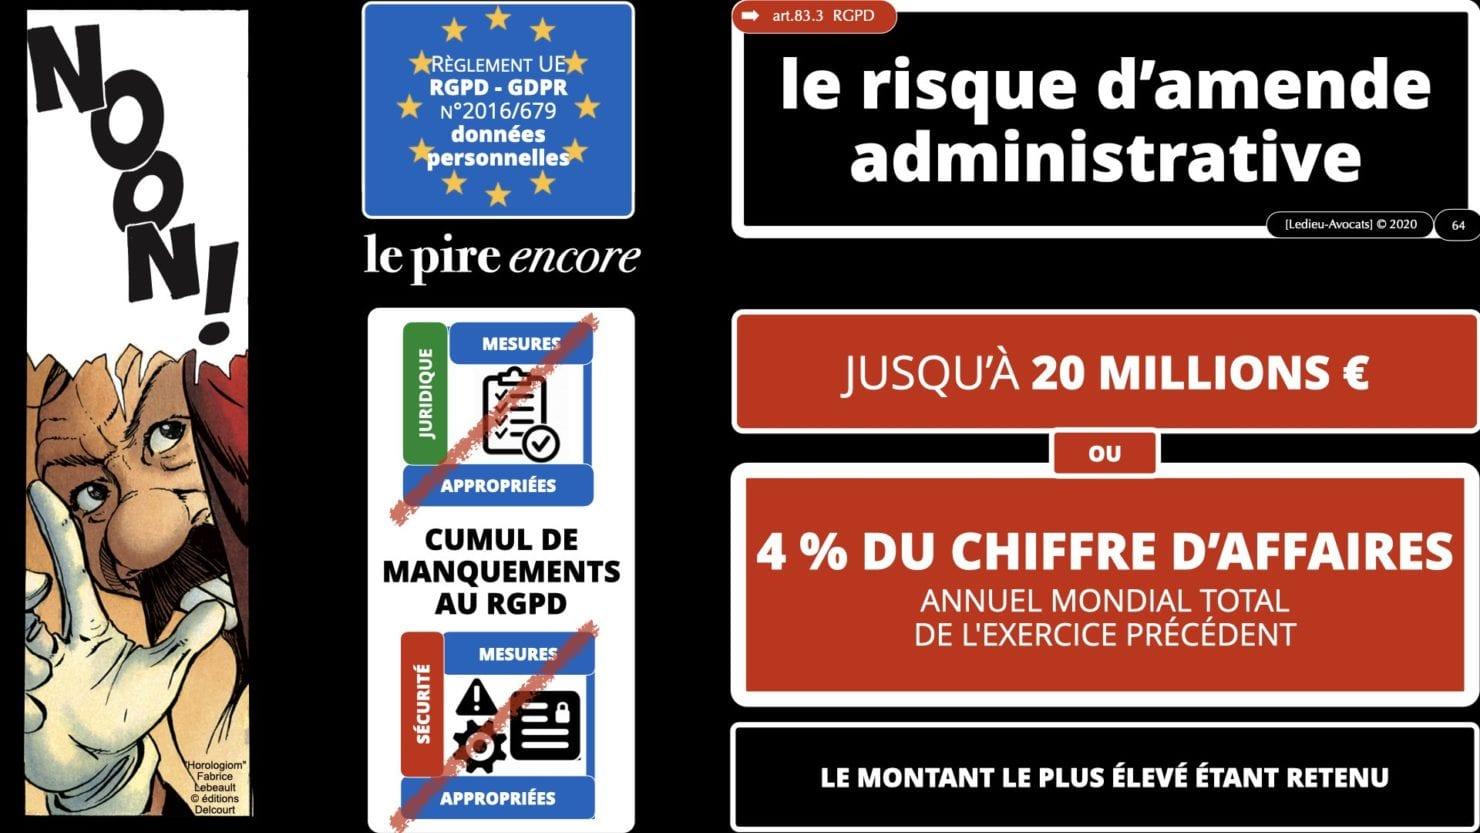 RGPD e-Privacy principes actualité jurisprudence ©Ledieu-Avocats 25-06-2021.064